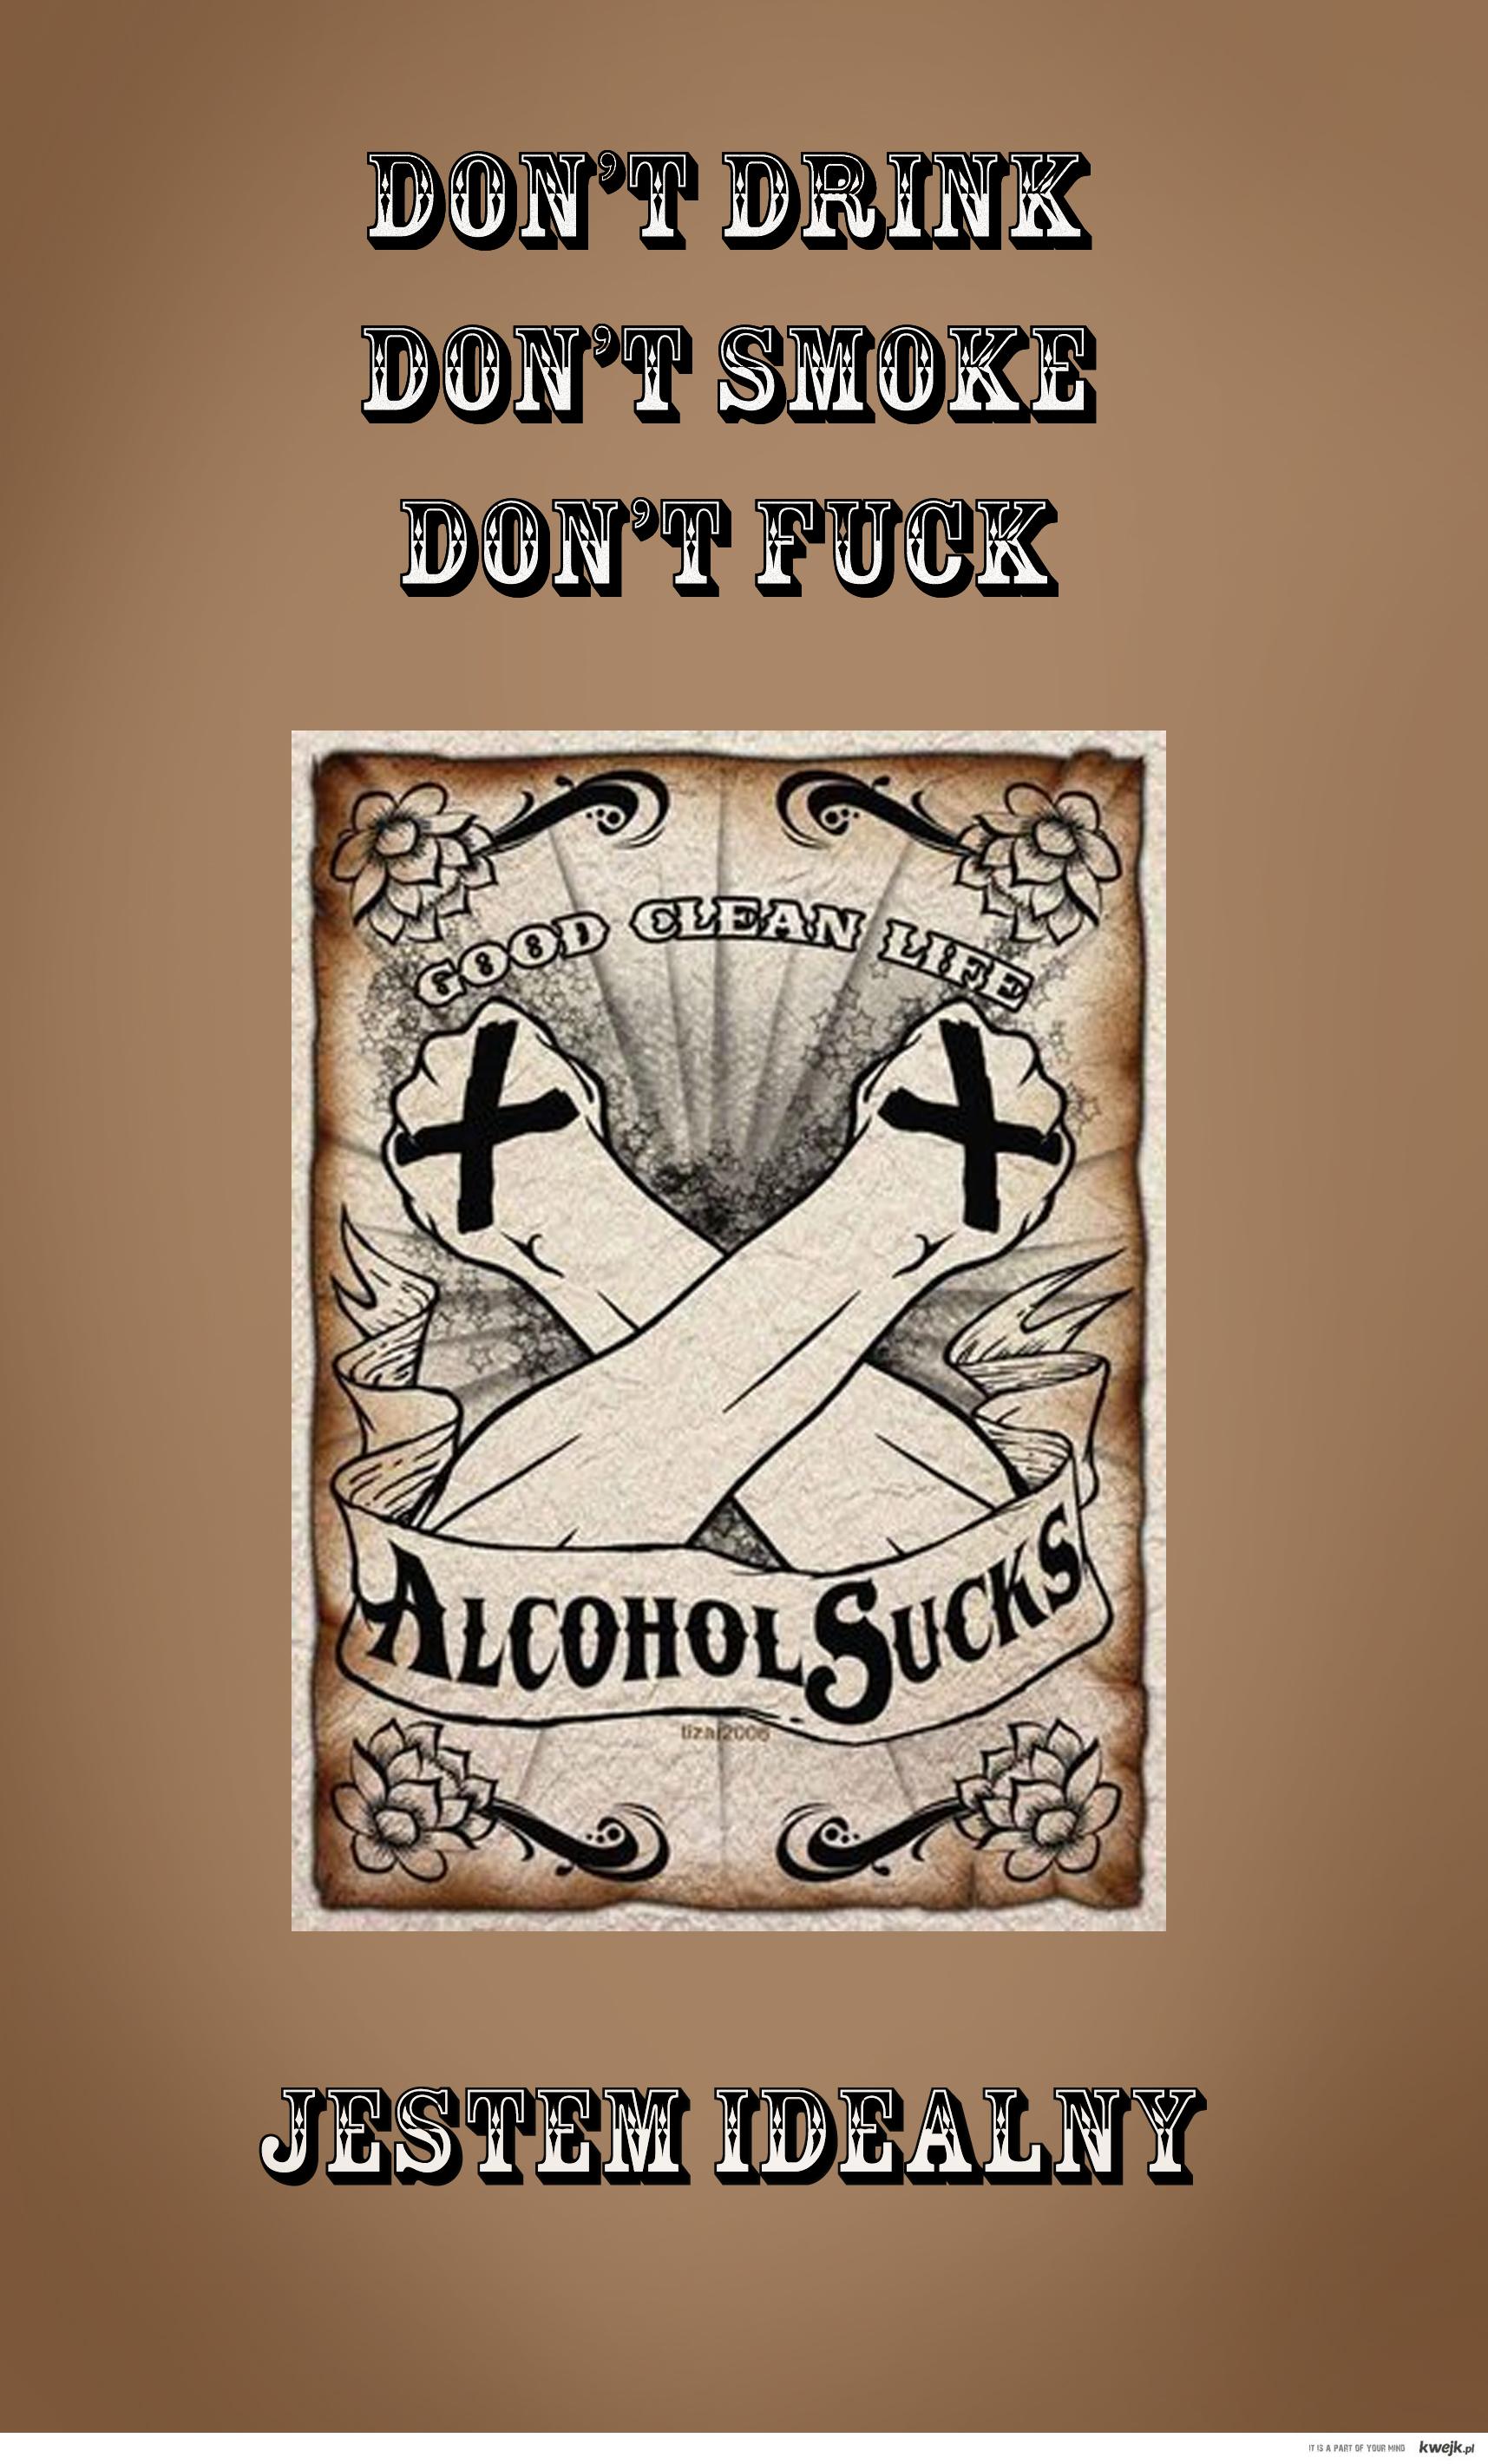 sxe, don't drink, don't smoke, don't fuck